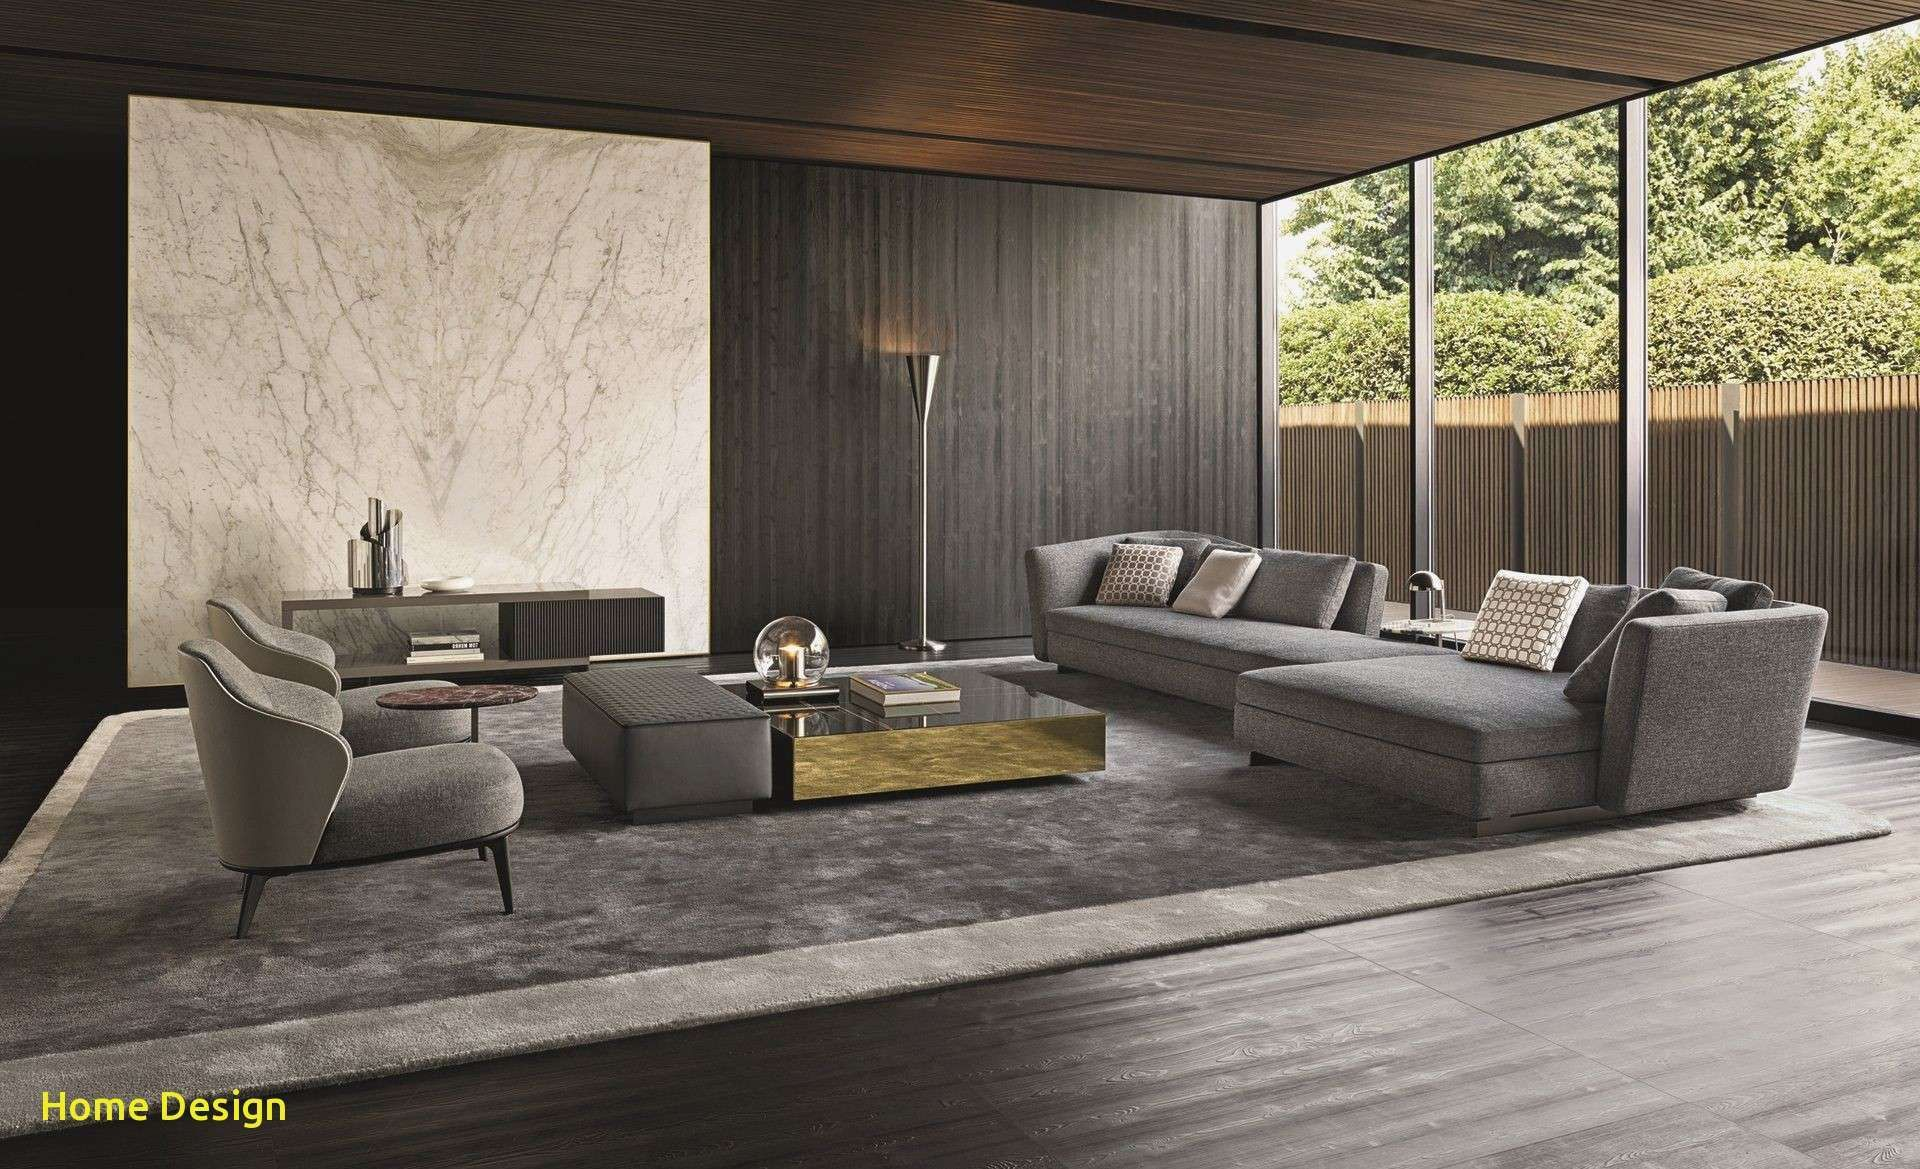 Grey Living Room Ideas Modern Best Of Italian Bedroom Furniture And Beautiful Moder Luxury Italian Furniture Interior Design Living Room Modern Italian Bedroom